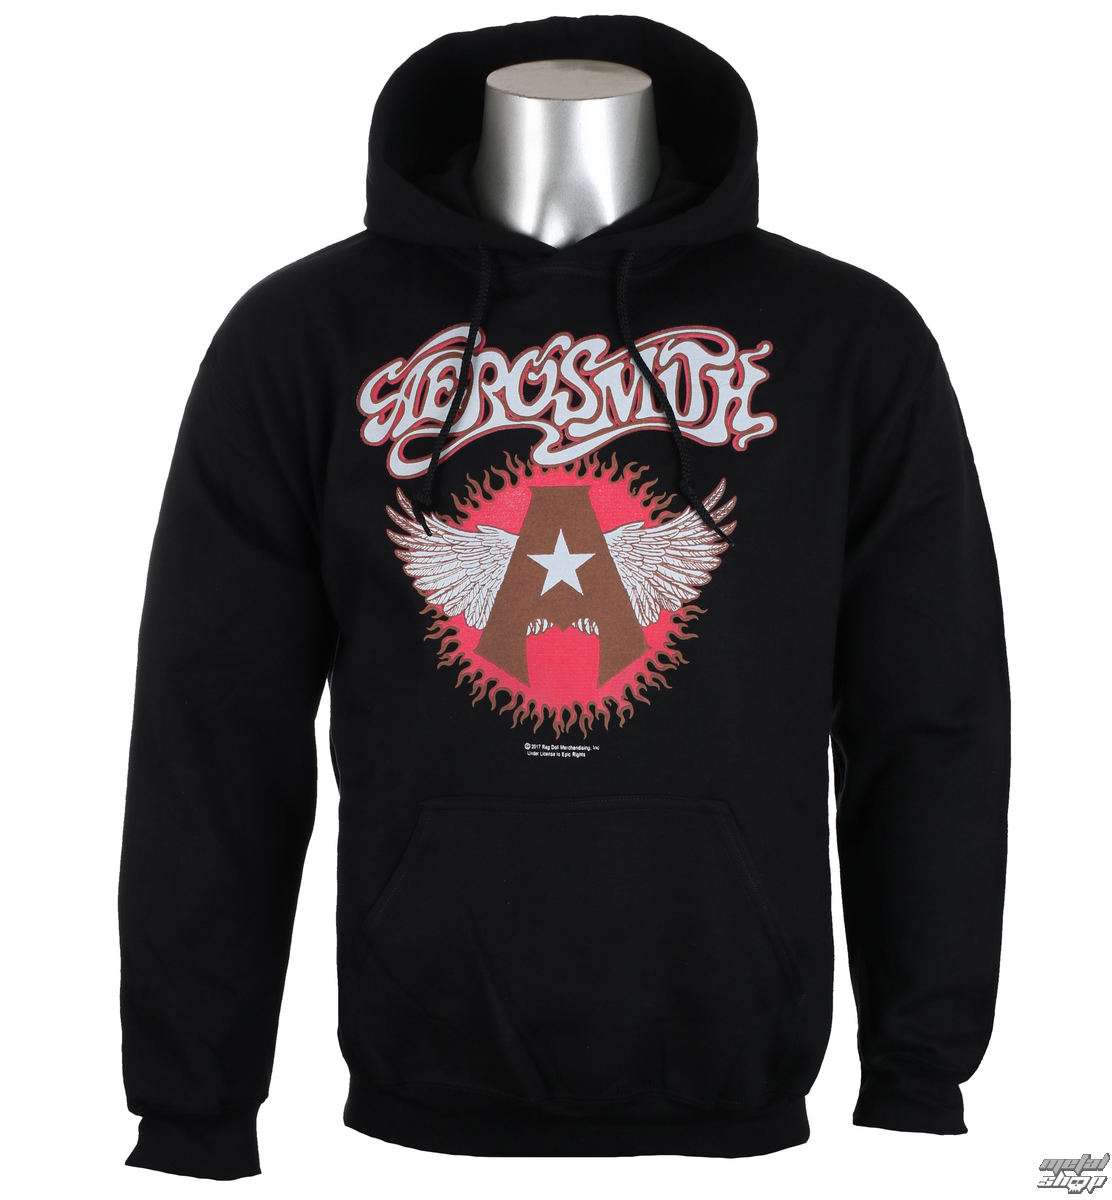 Aerosmith Classic Pullover Hoodie